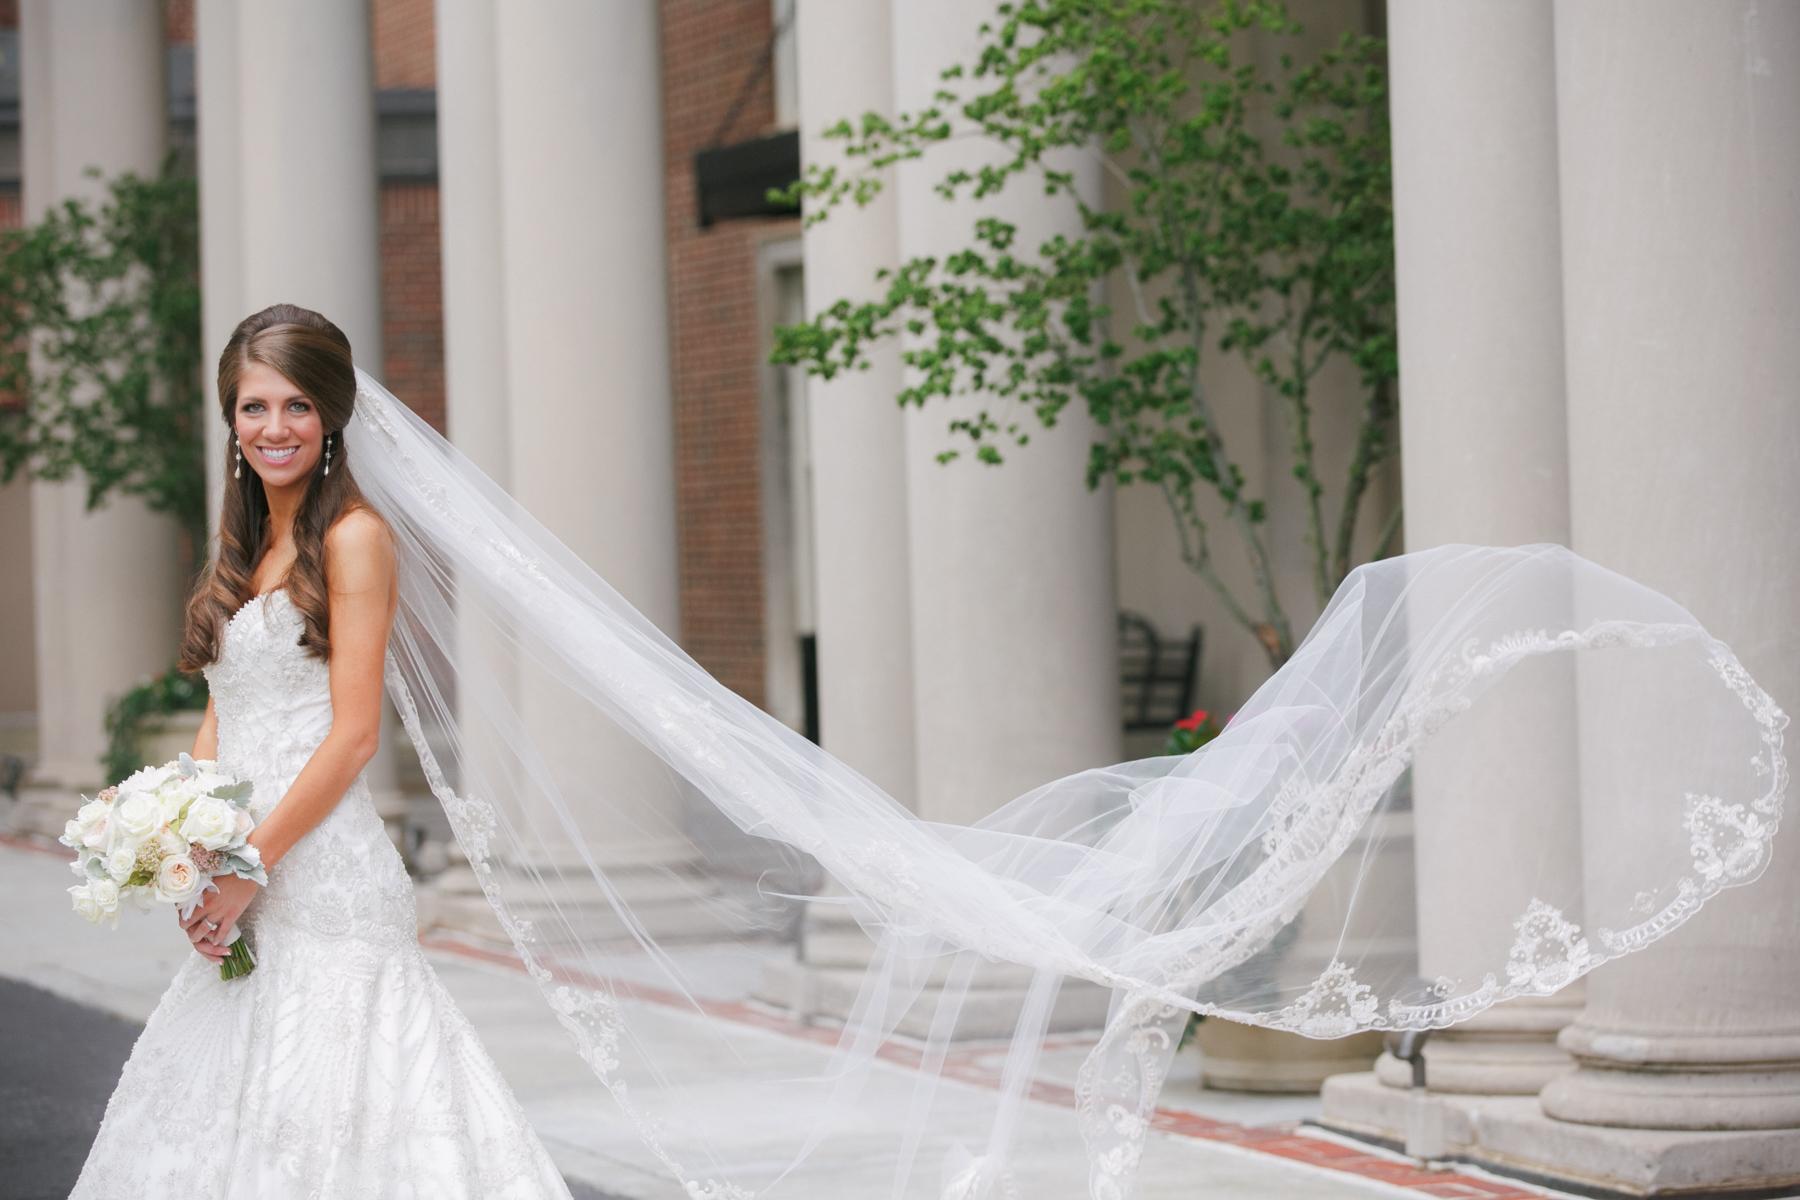 Biltmore-Ballrooms-Wedding-Atlanta_0007c